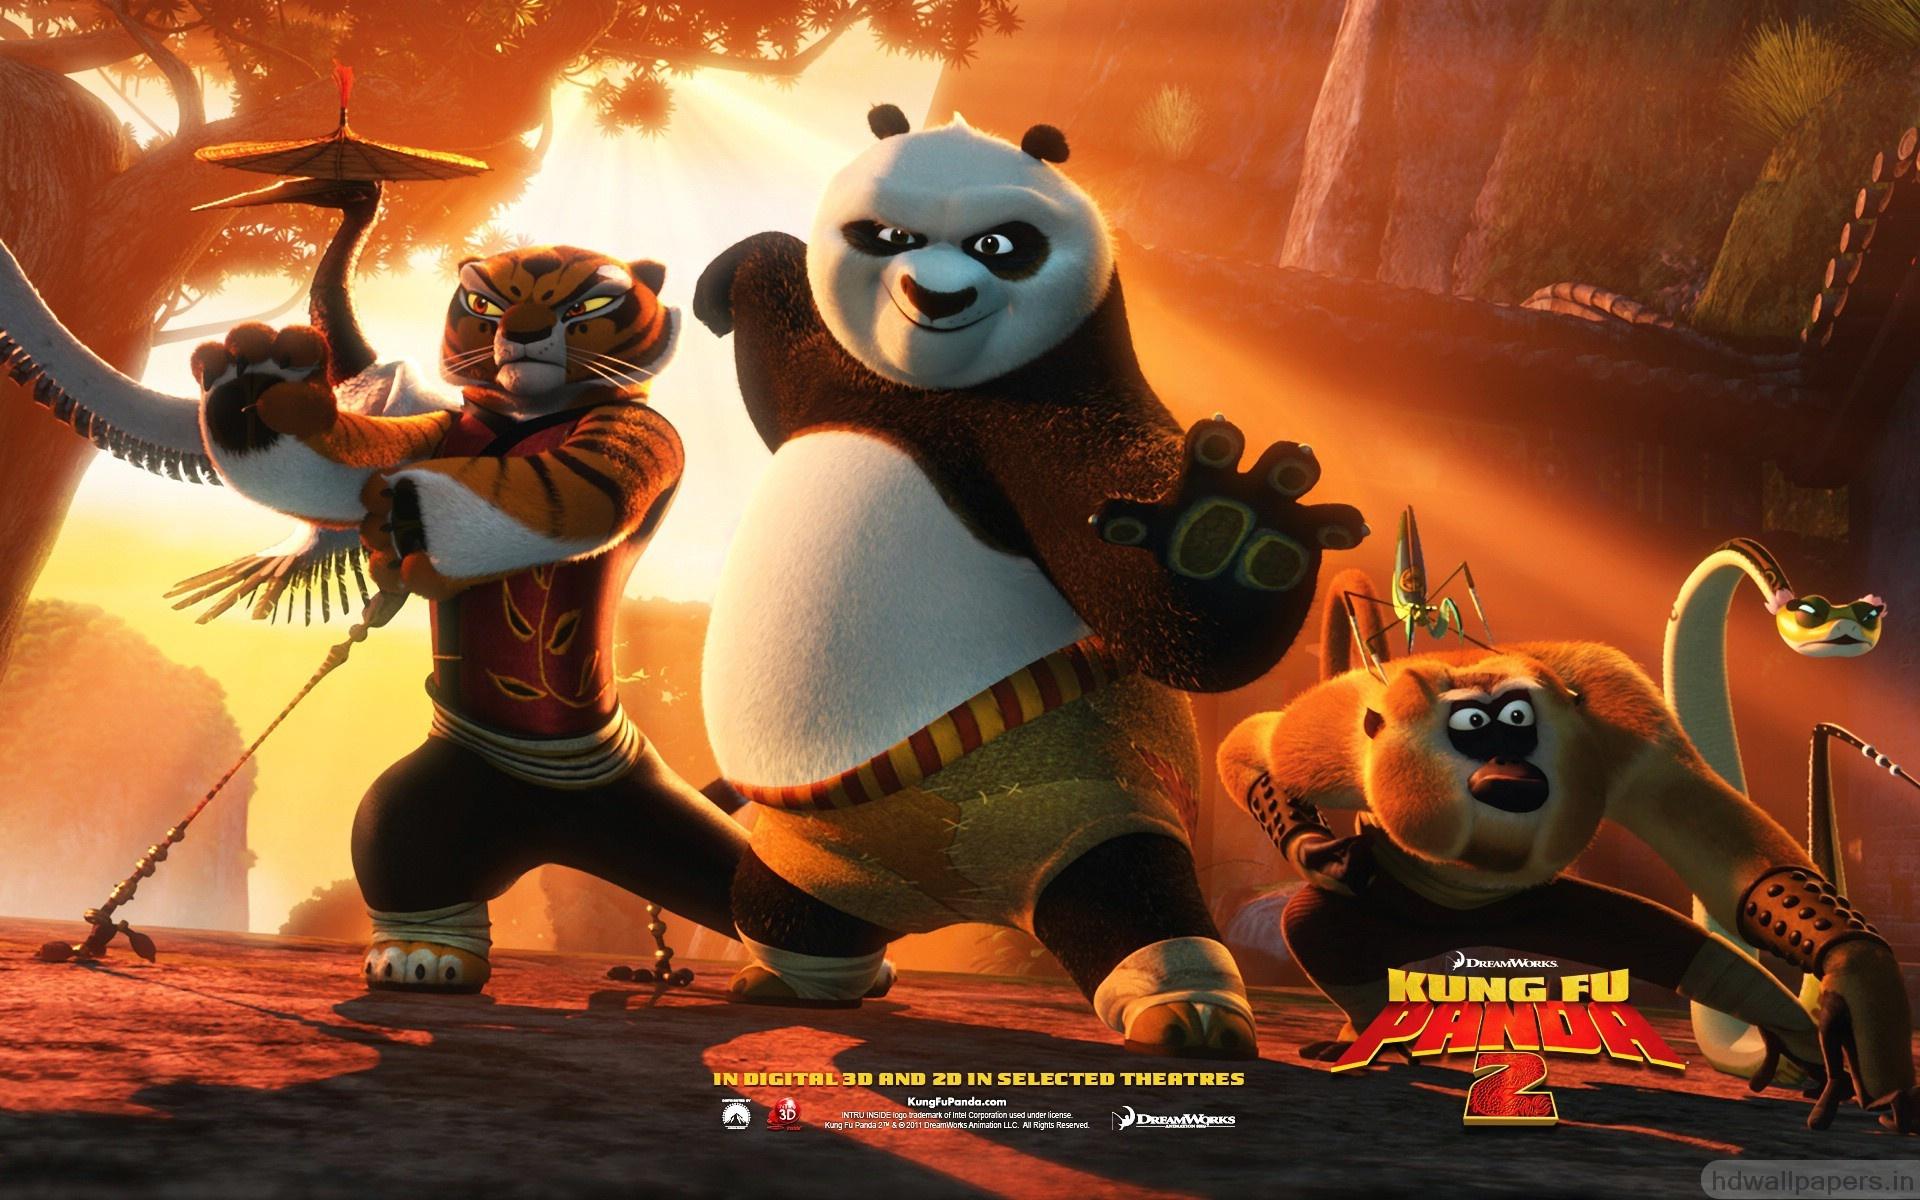 Master croc from kung fu panda 2 movie desktop wallpaper.